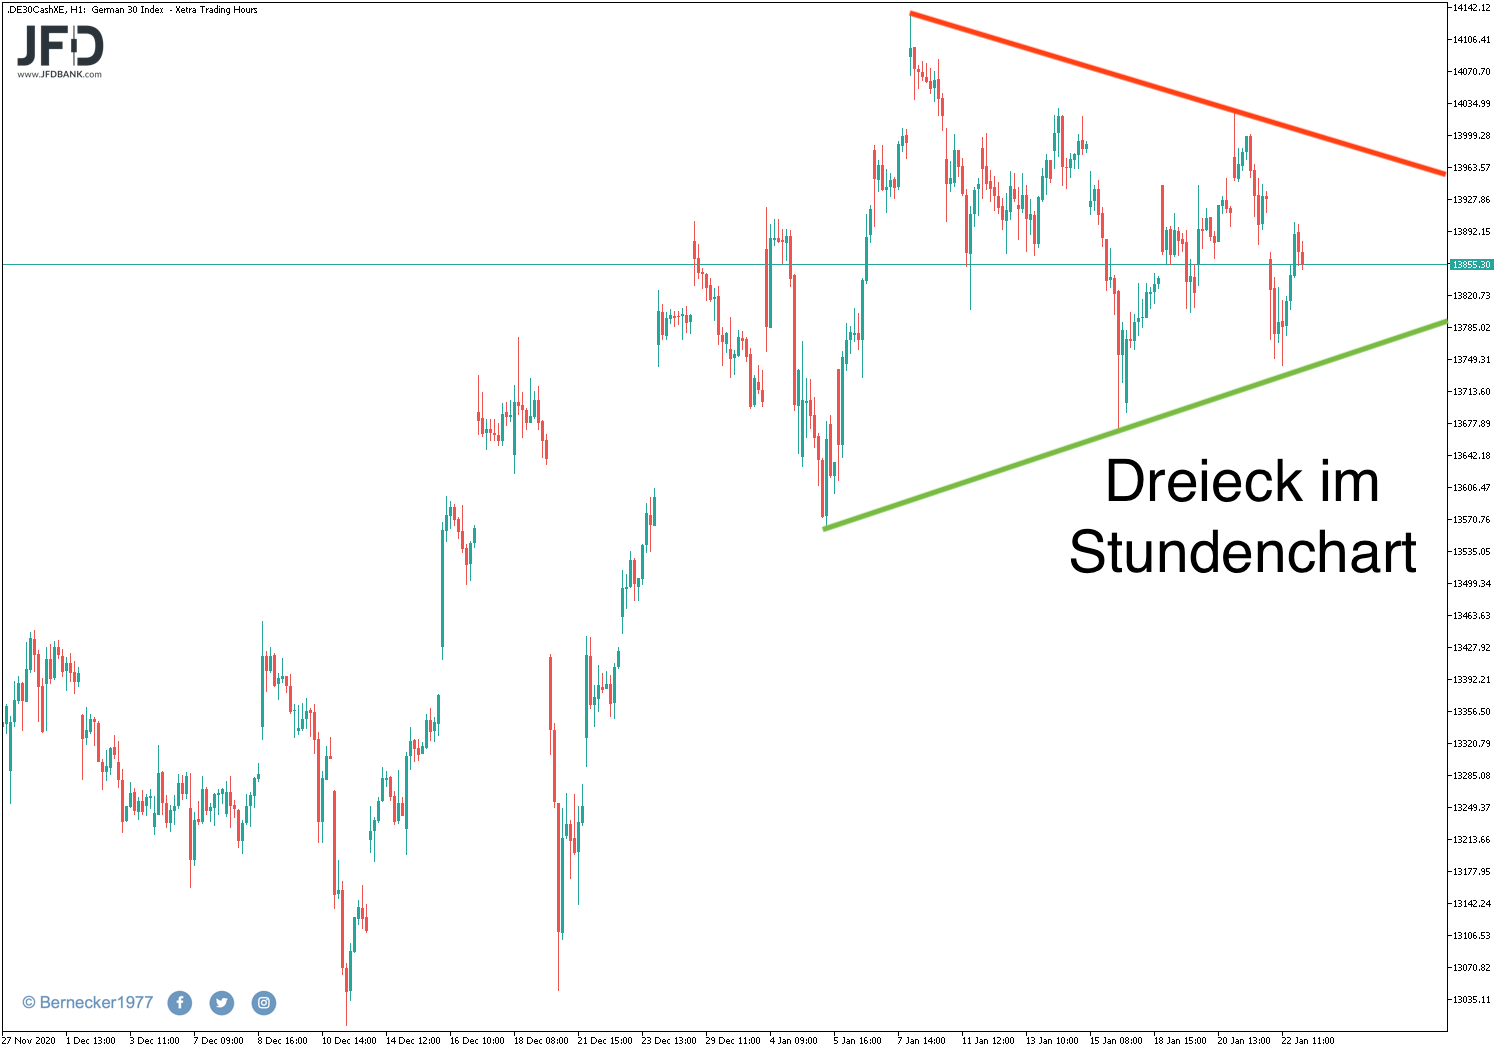 Dreieck im DAX-Stundenchart